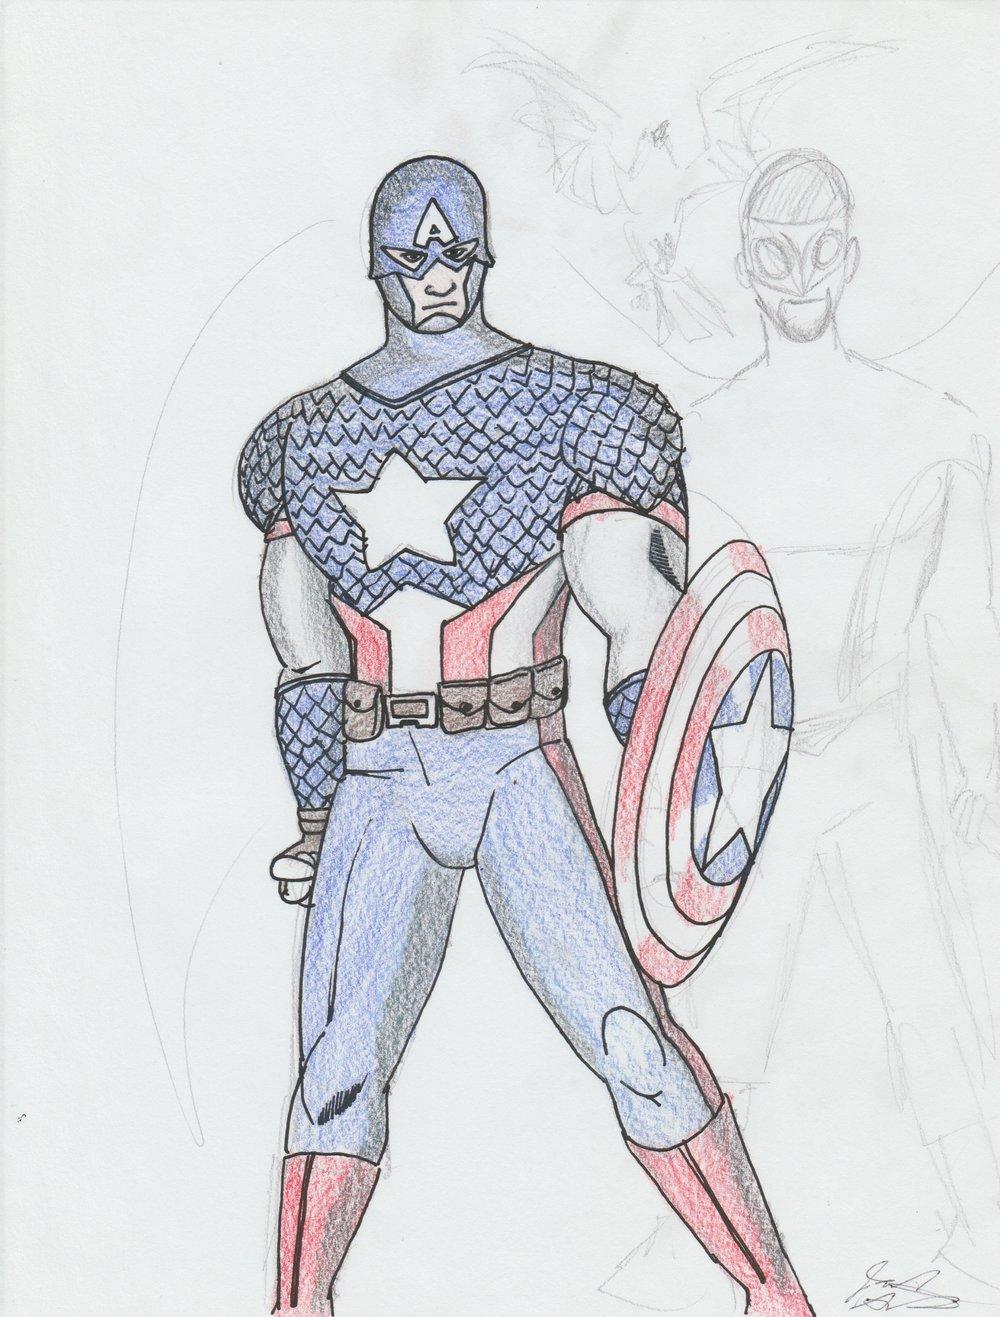 Captain America Costume With A Slight Re-Design